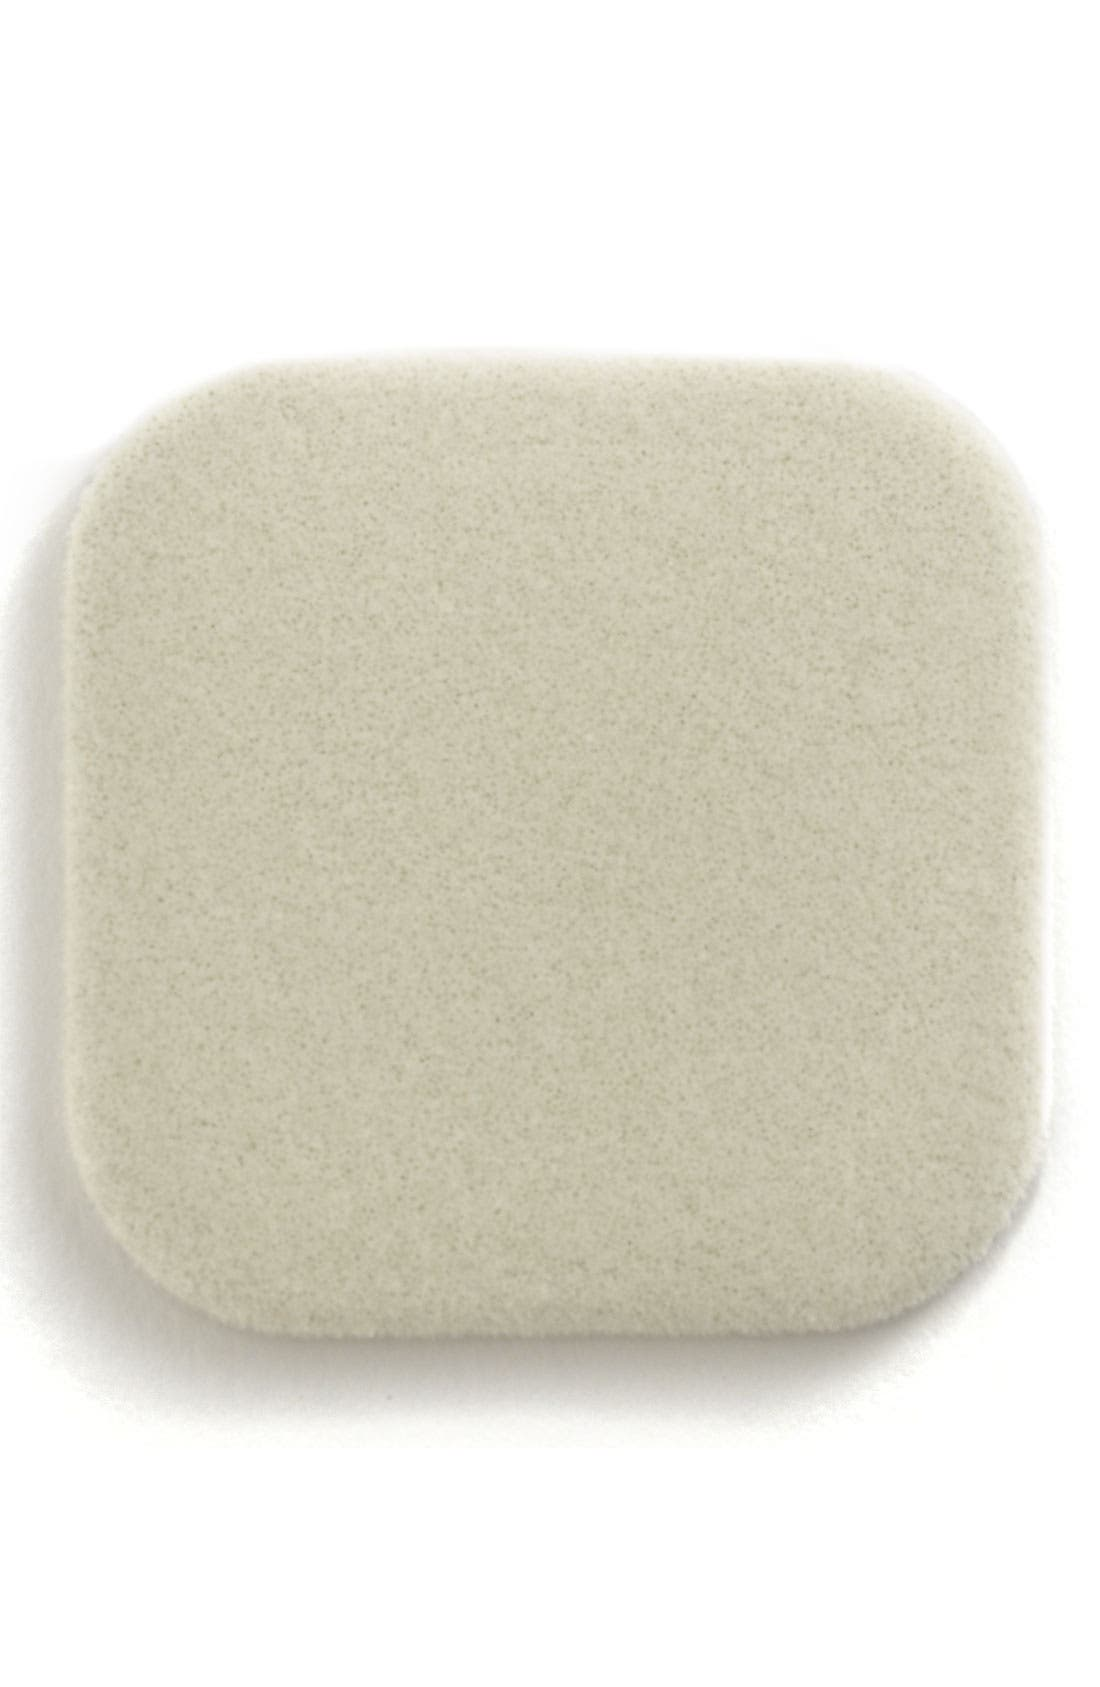 Refining Pressed Powder Puff,                         Main,                         color, 000